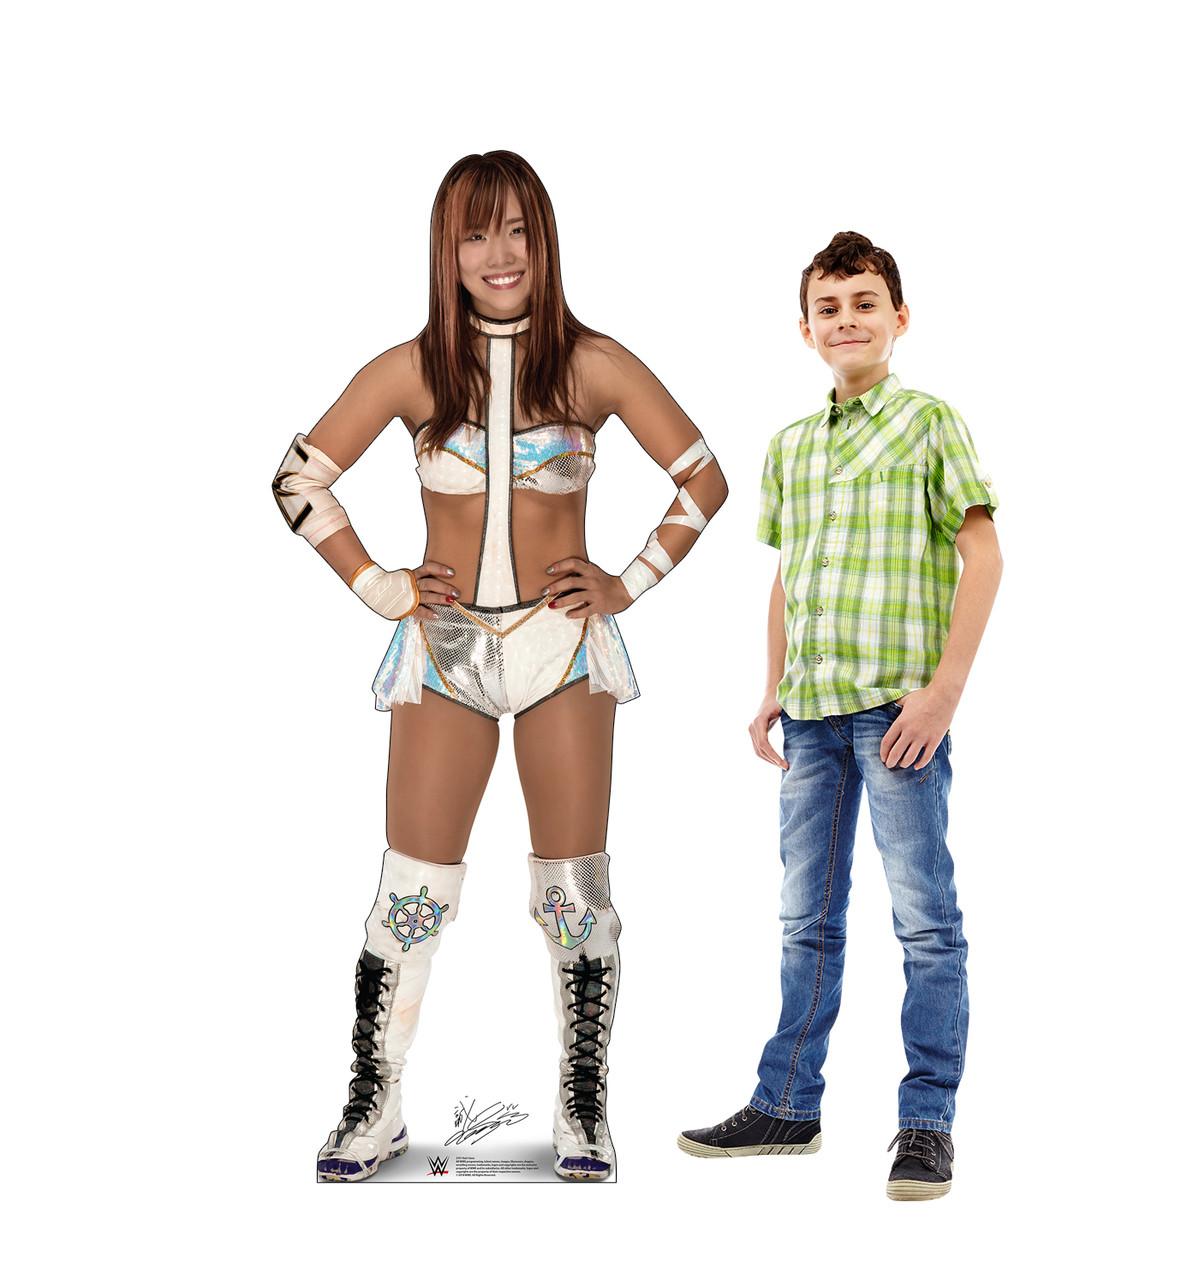 Kairi Sane Life-size cardboard standee with model.